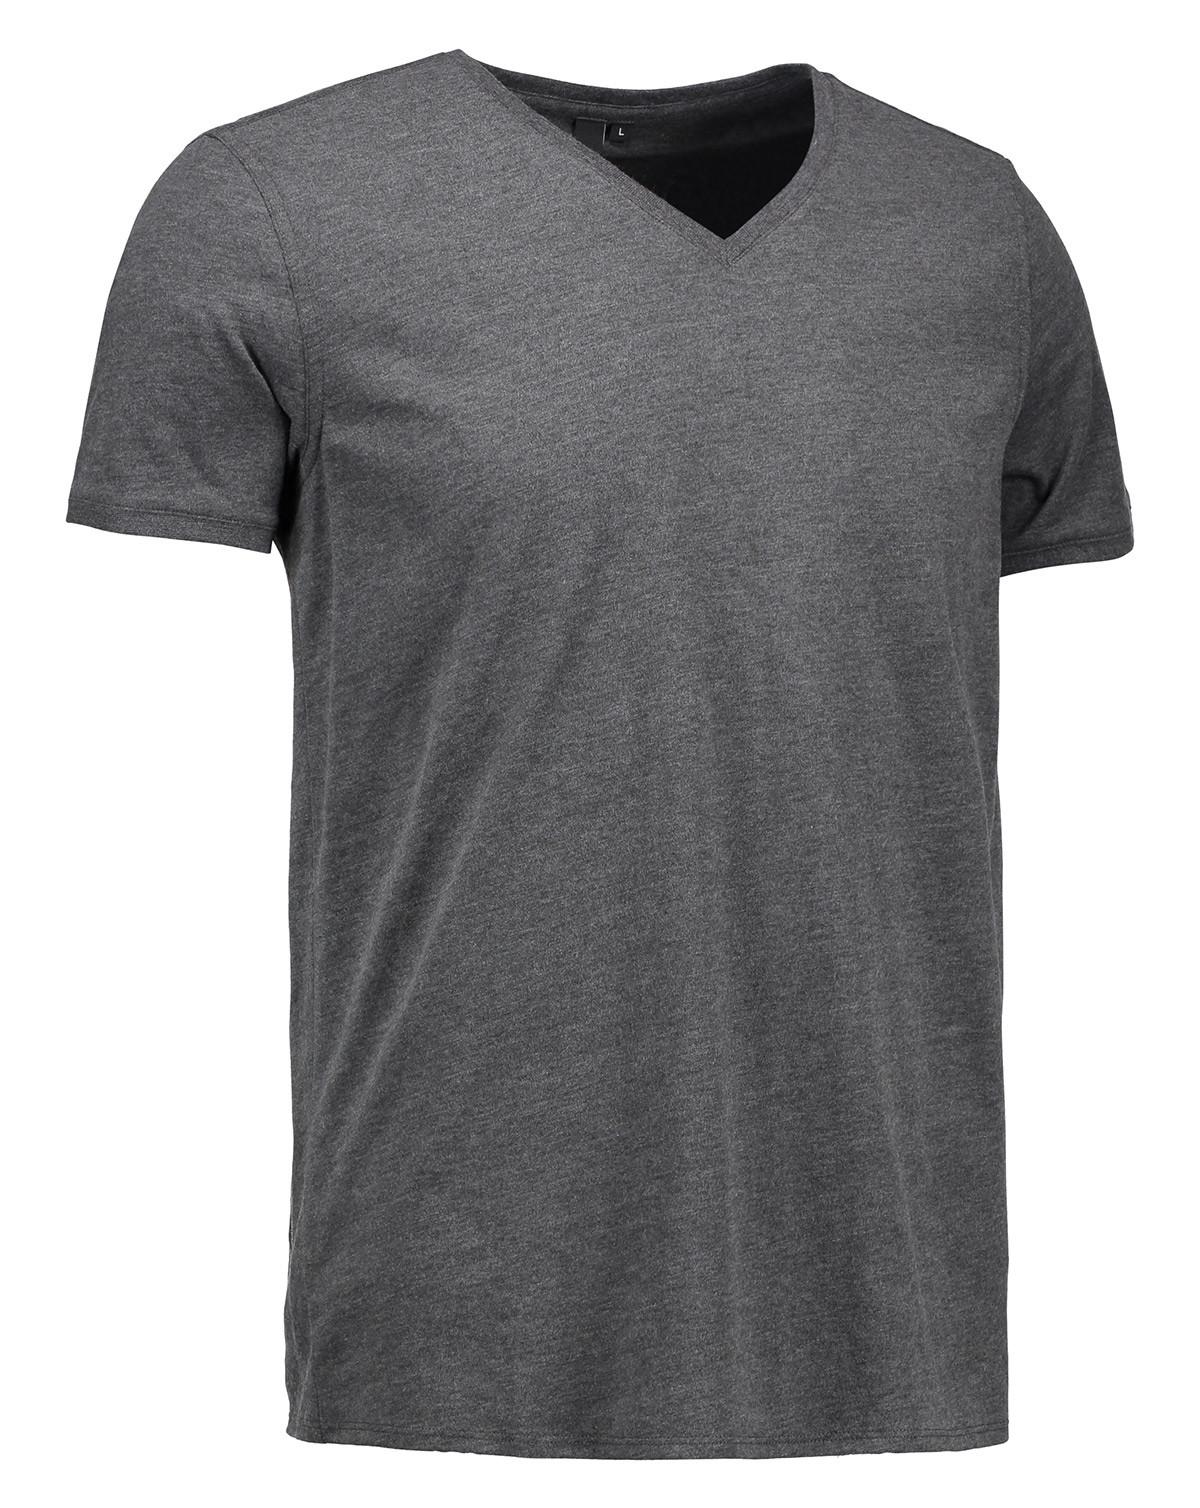 ID T-shirt Core V-Neck (Charcoal, 3XL)